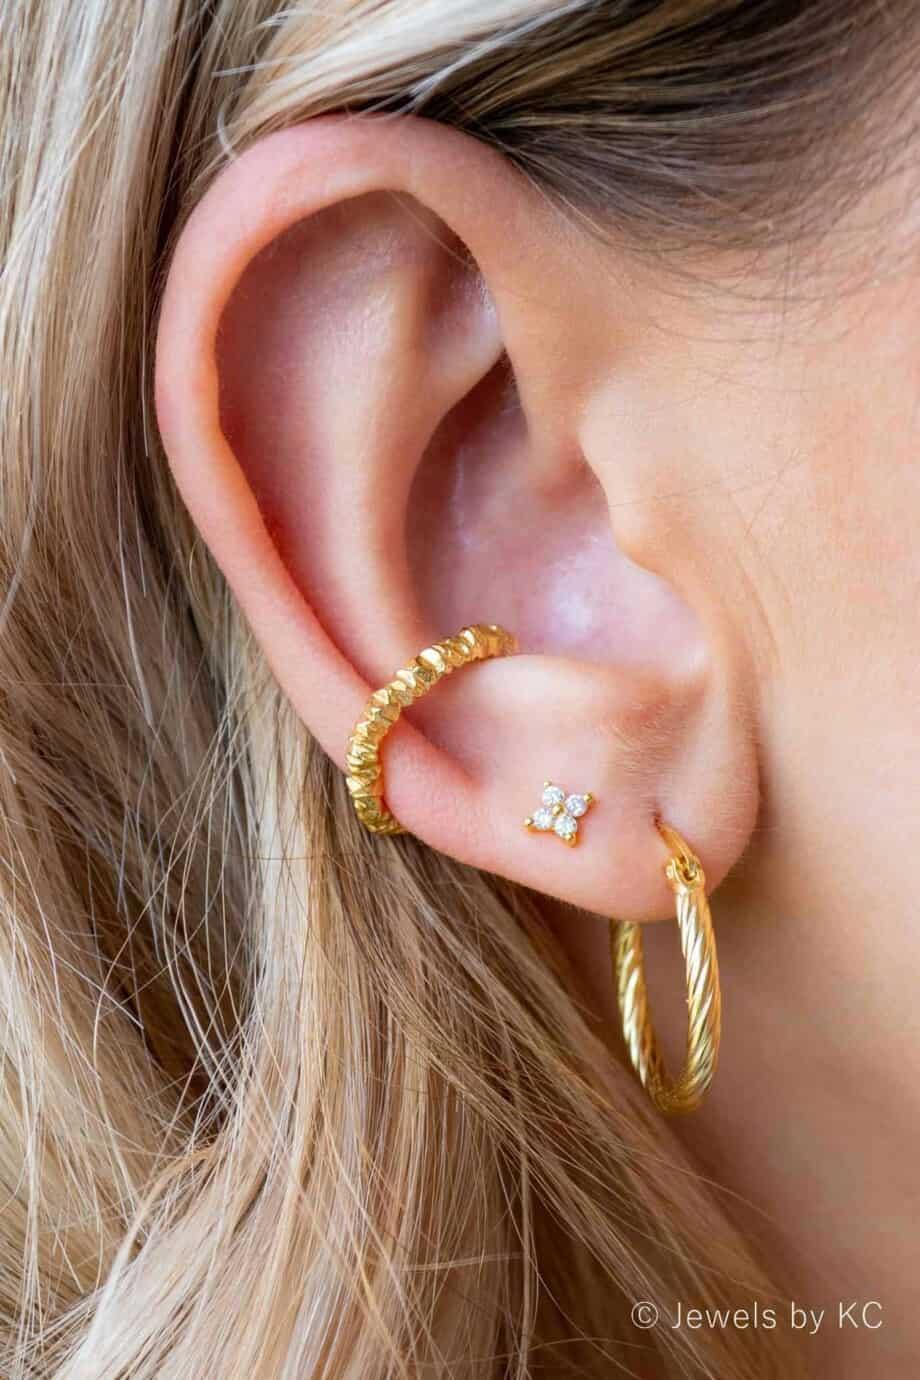 Gouden ear cuff 'Rocky' van Goud op Zilver